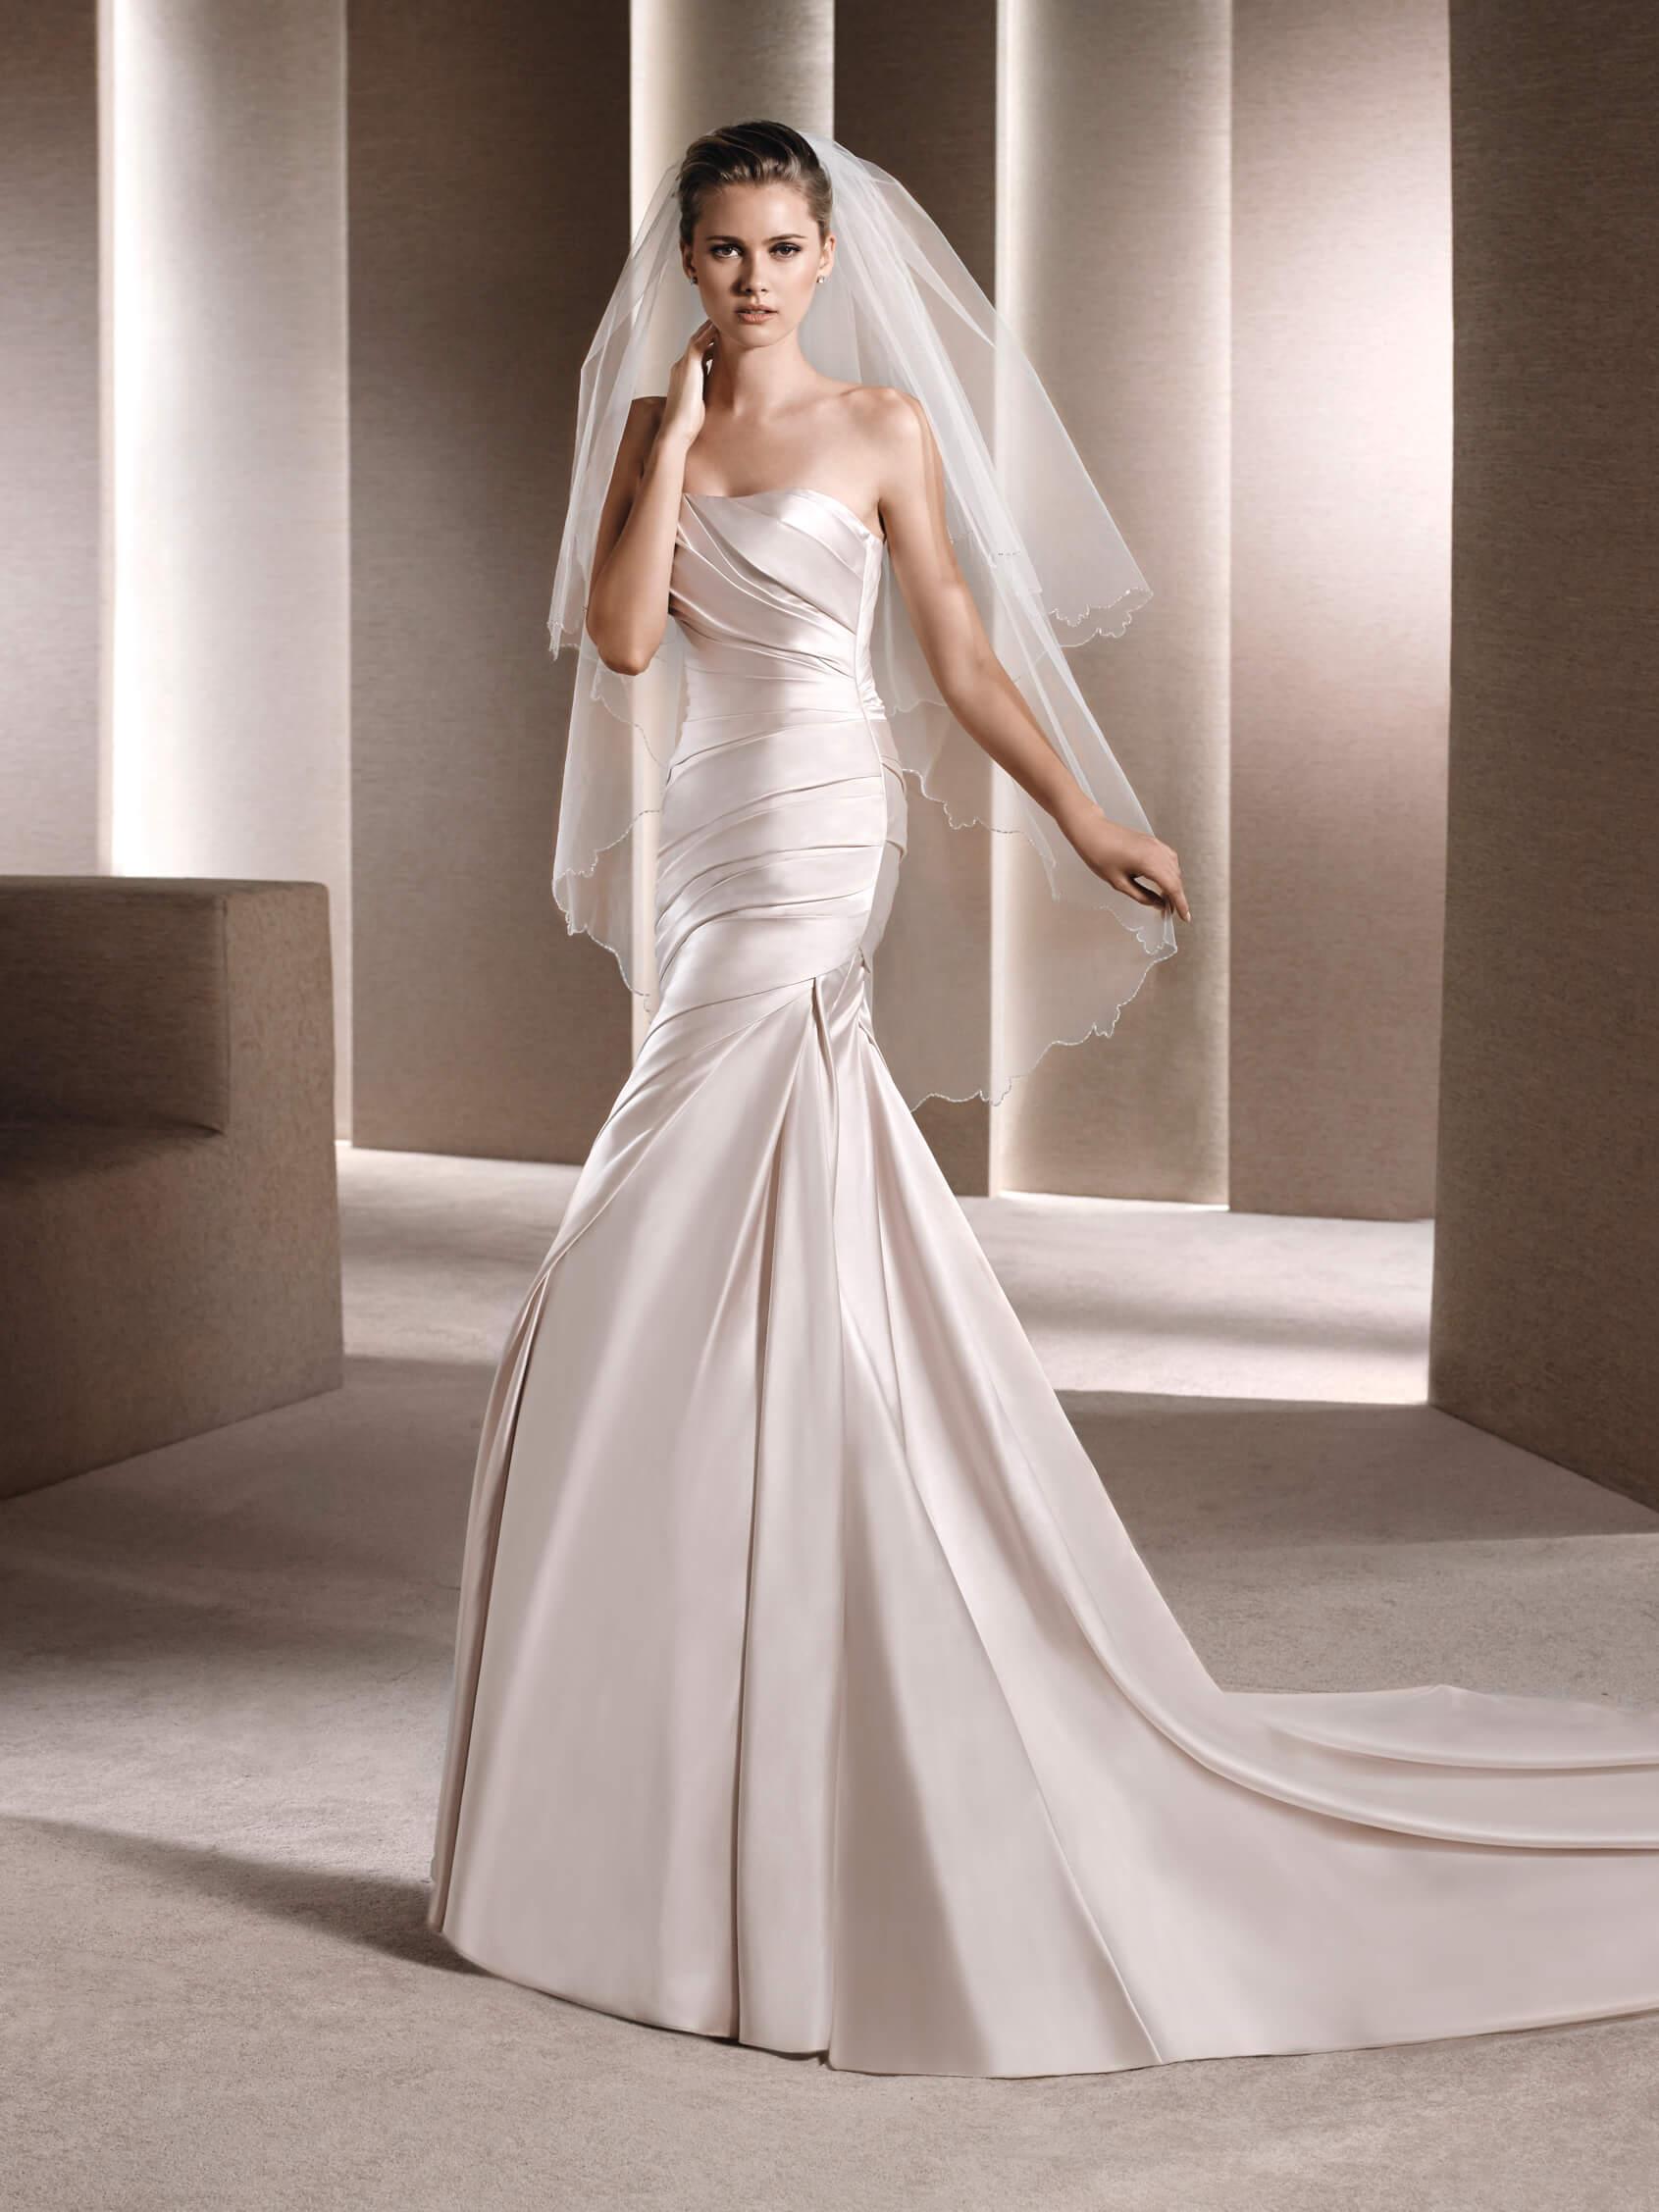 Wedding dresses, bridesmaid dresses, Bristol, Somerset, Wiltshire